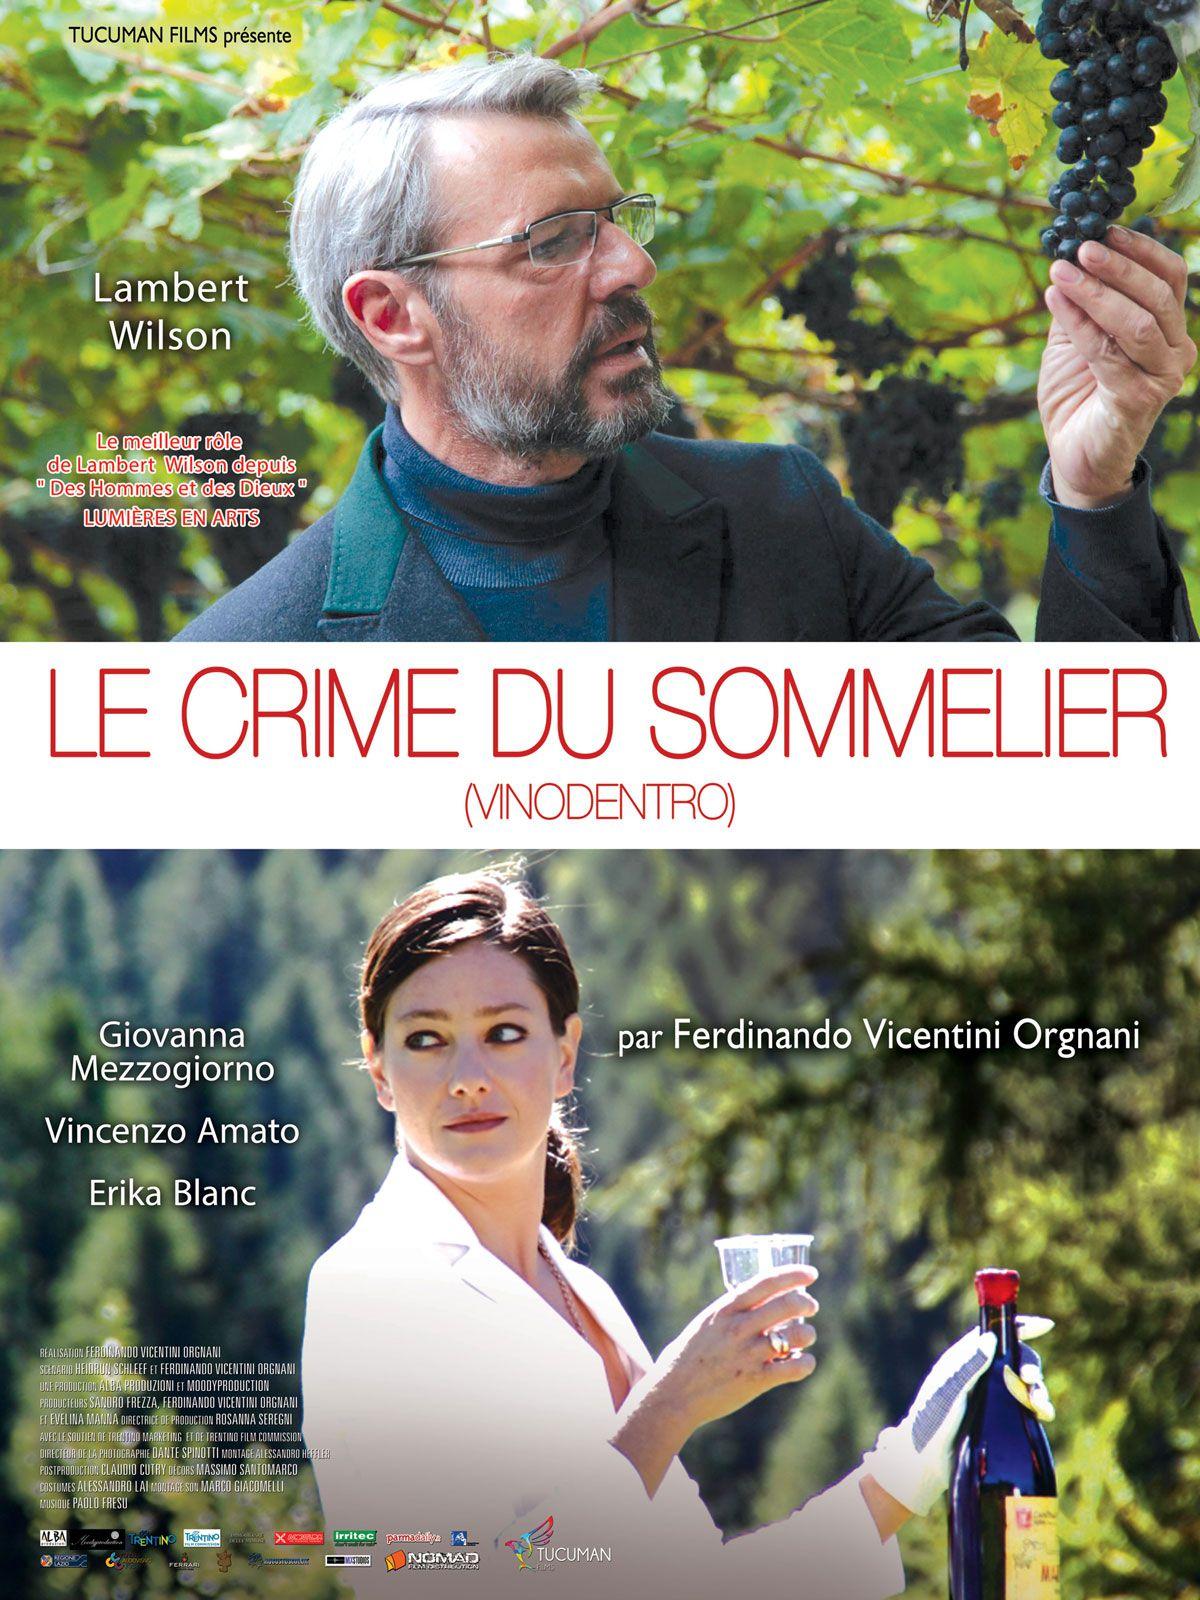 Le Crime du sommelier - Film (2016)